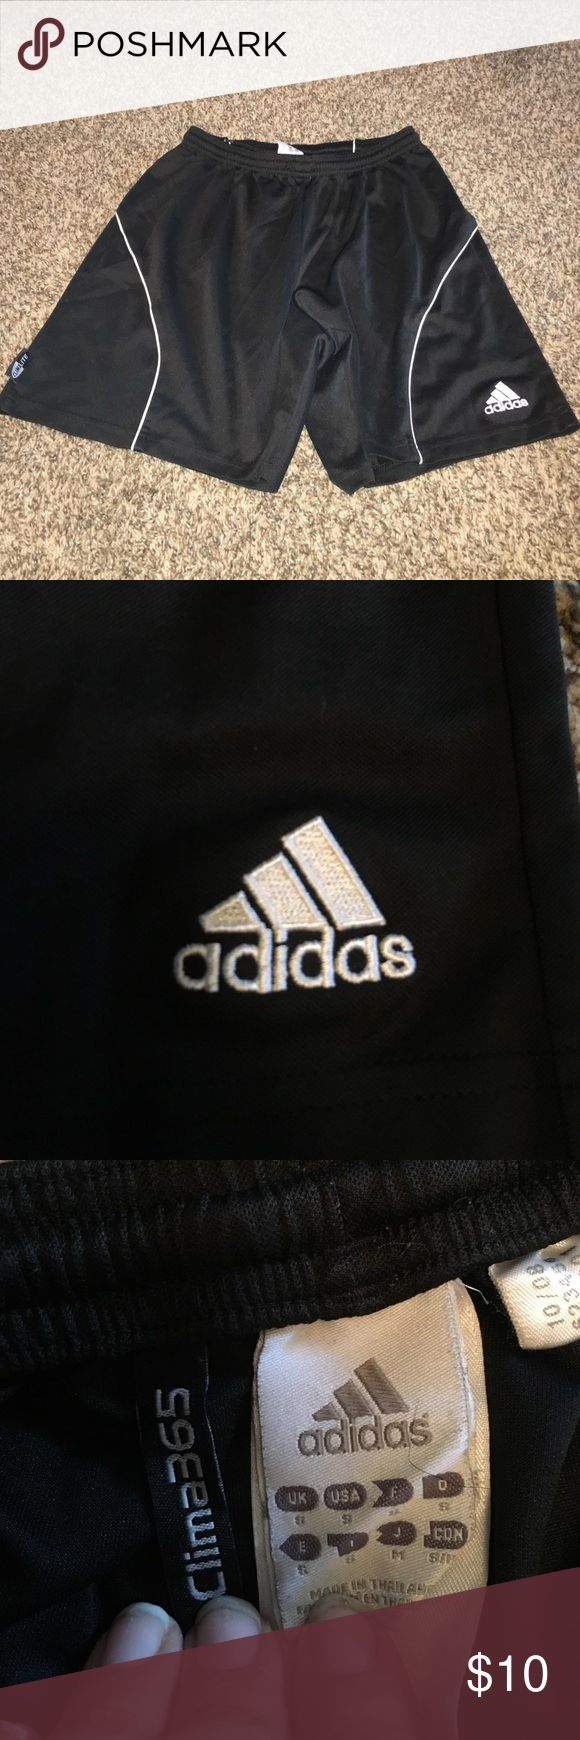 Black adidas soccer shorts All black adidas soccer shorts. Climacool material, gently worn. Size small Adidas Shorts